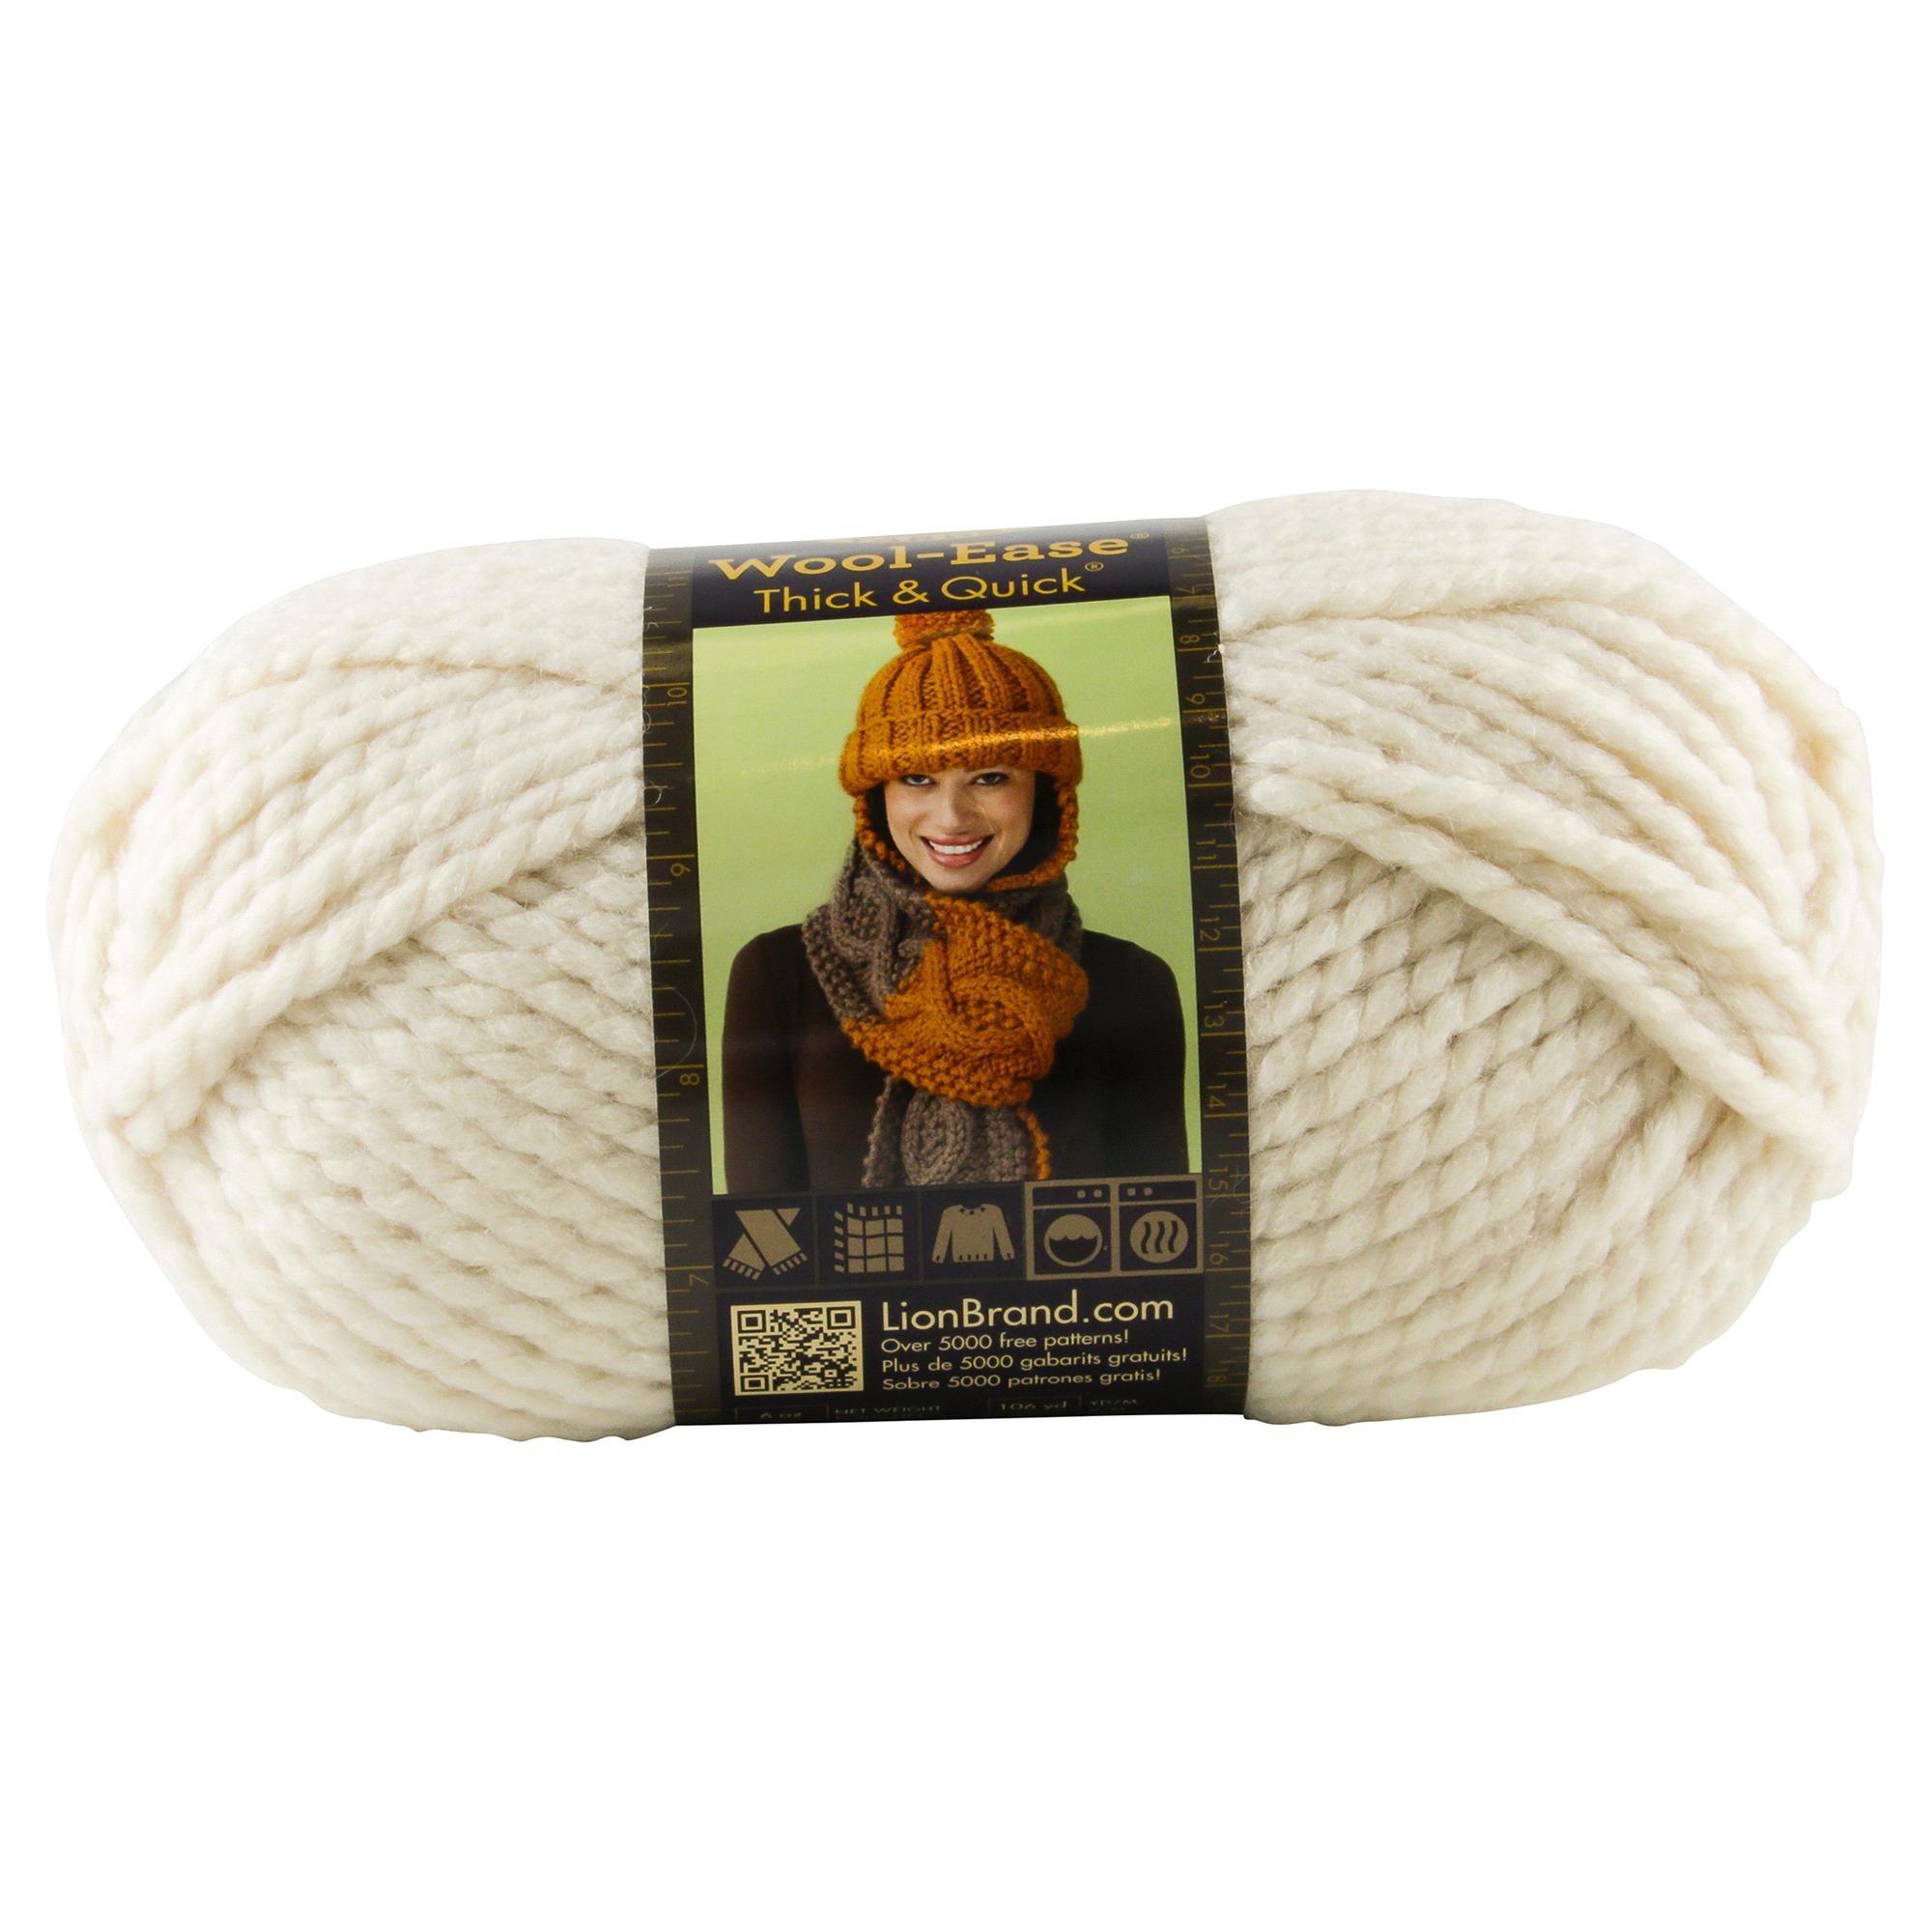 Increíble Patrón De Crochet Libre De Narval Ornamento - Manta de ...